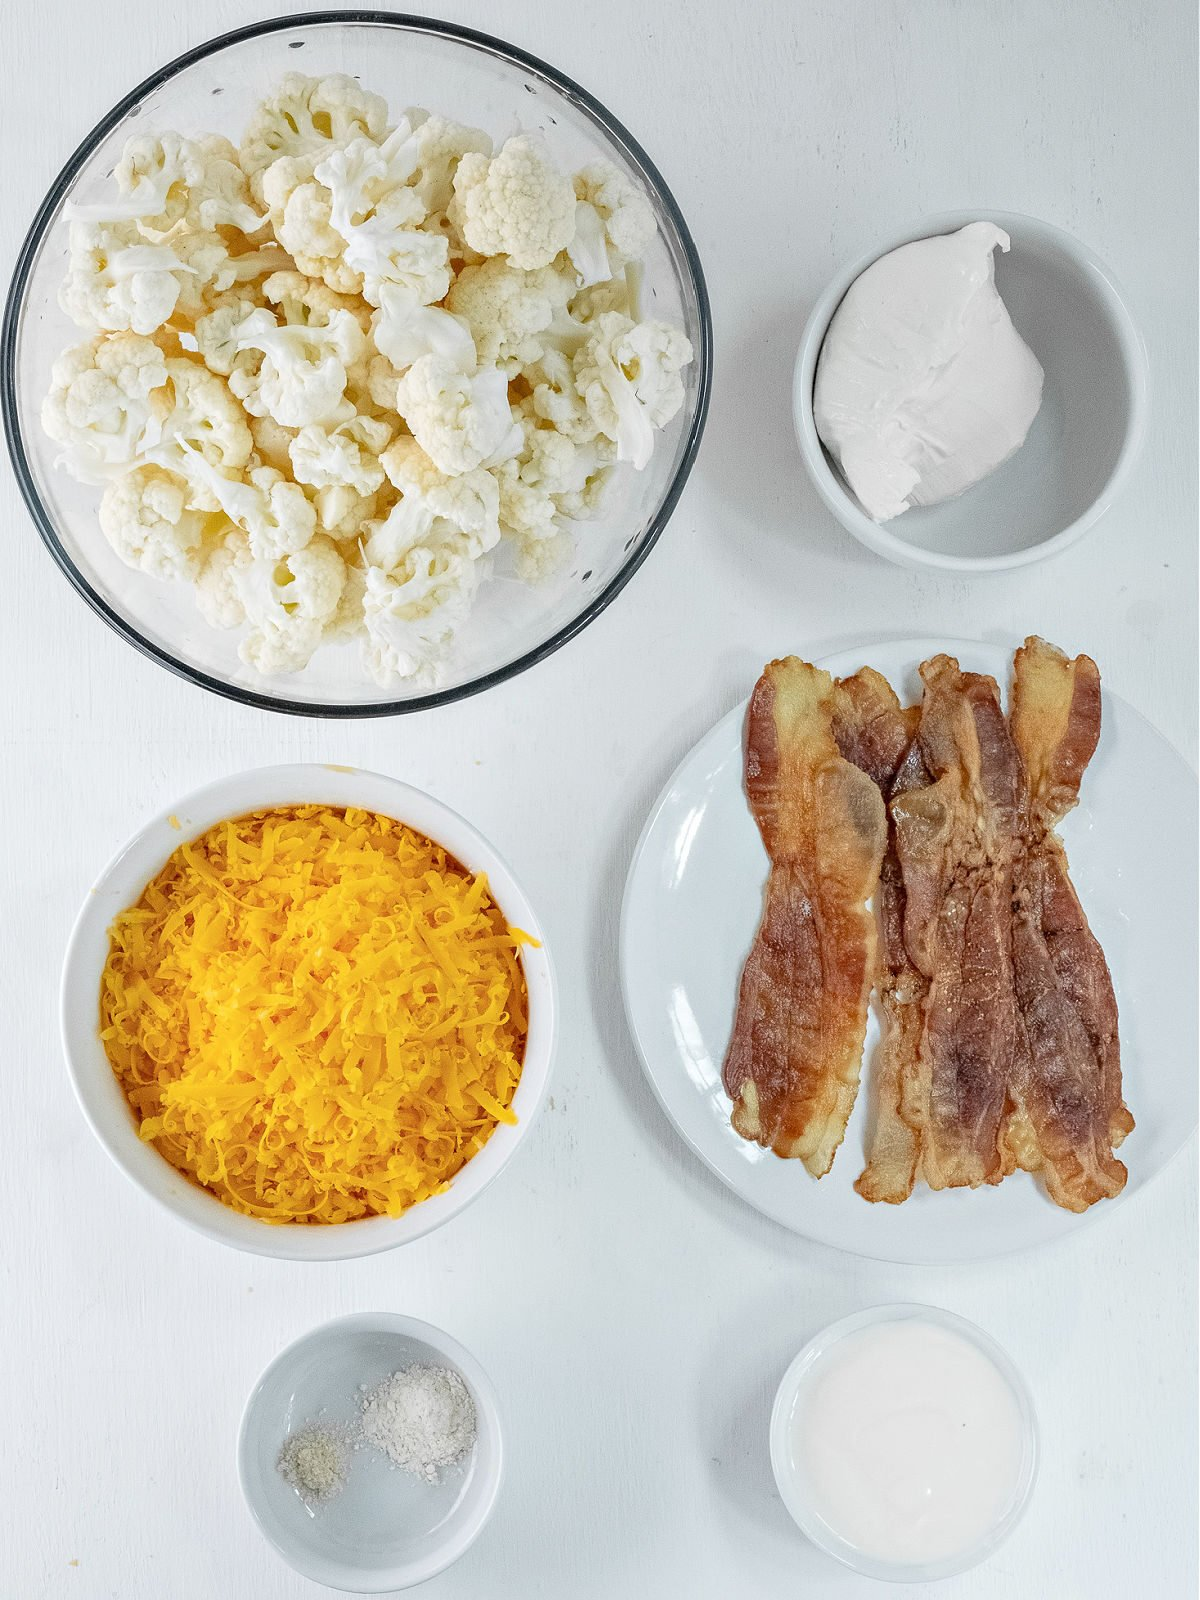 Bowl of cauliflower, bowl of Cheddar cheese, ramekin with cream cheese, plate of bacon, and ramekins of seasonings.